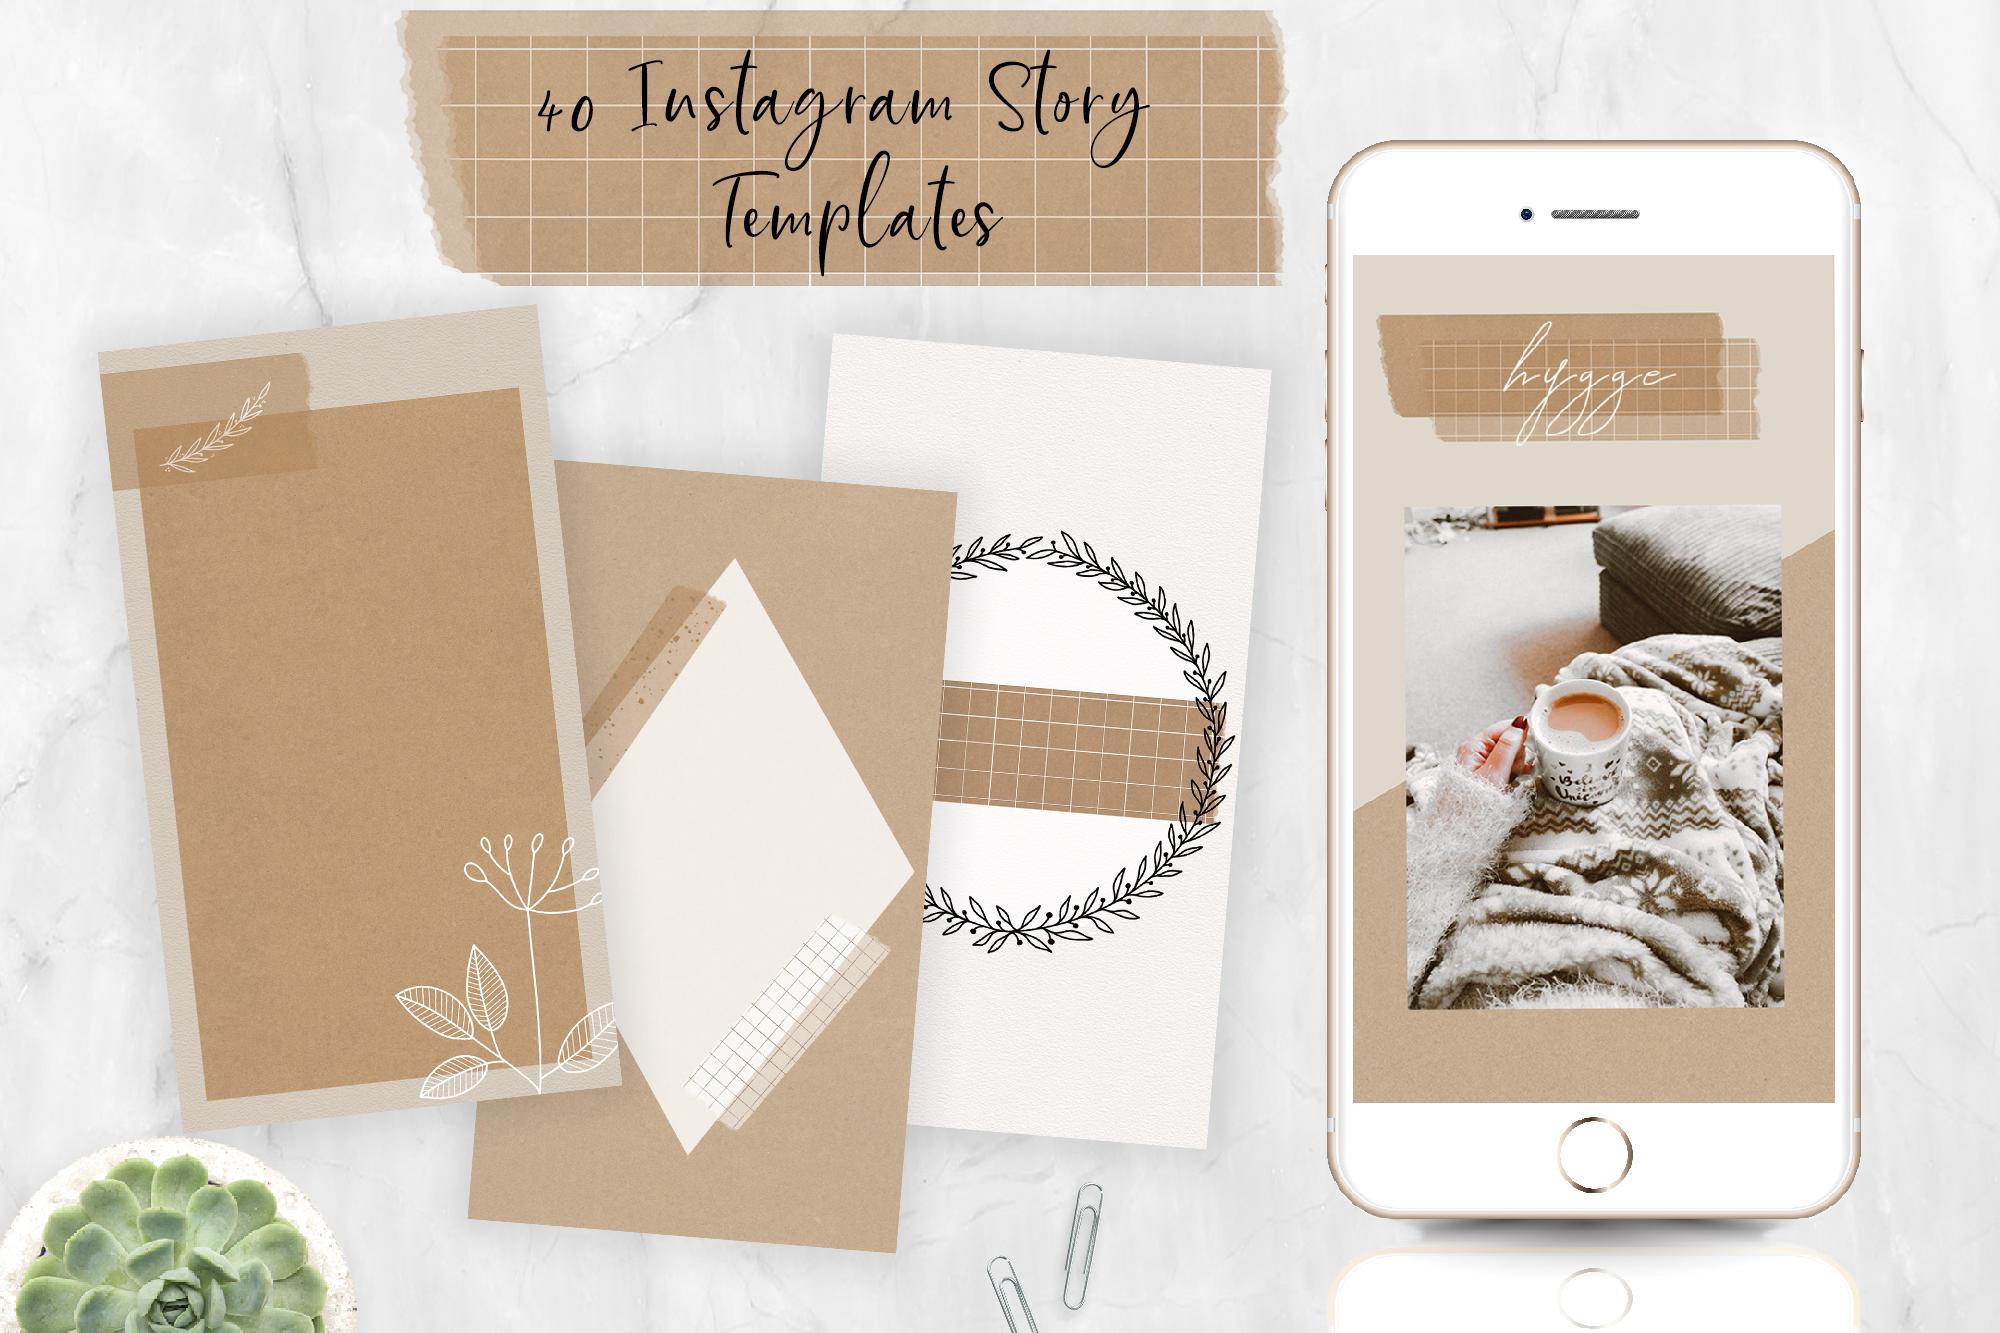 40 Instagram Story Templates | Feminine Style. Social Media example image 1